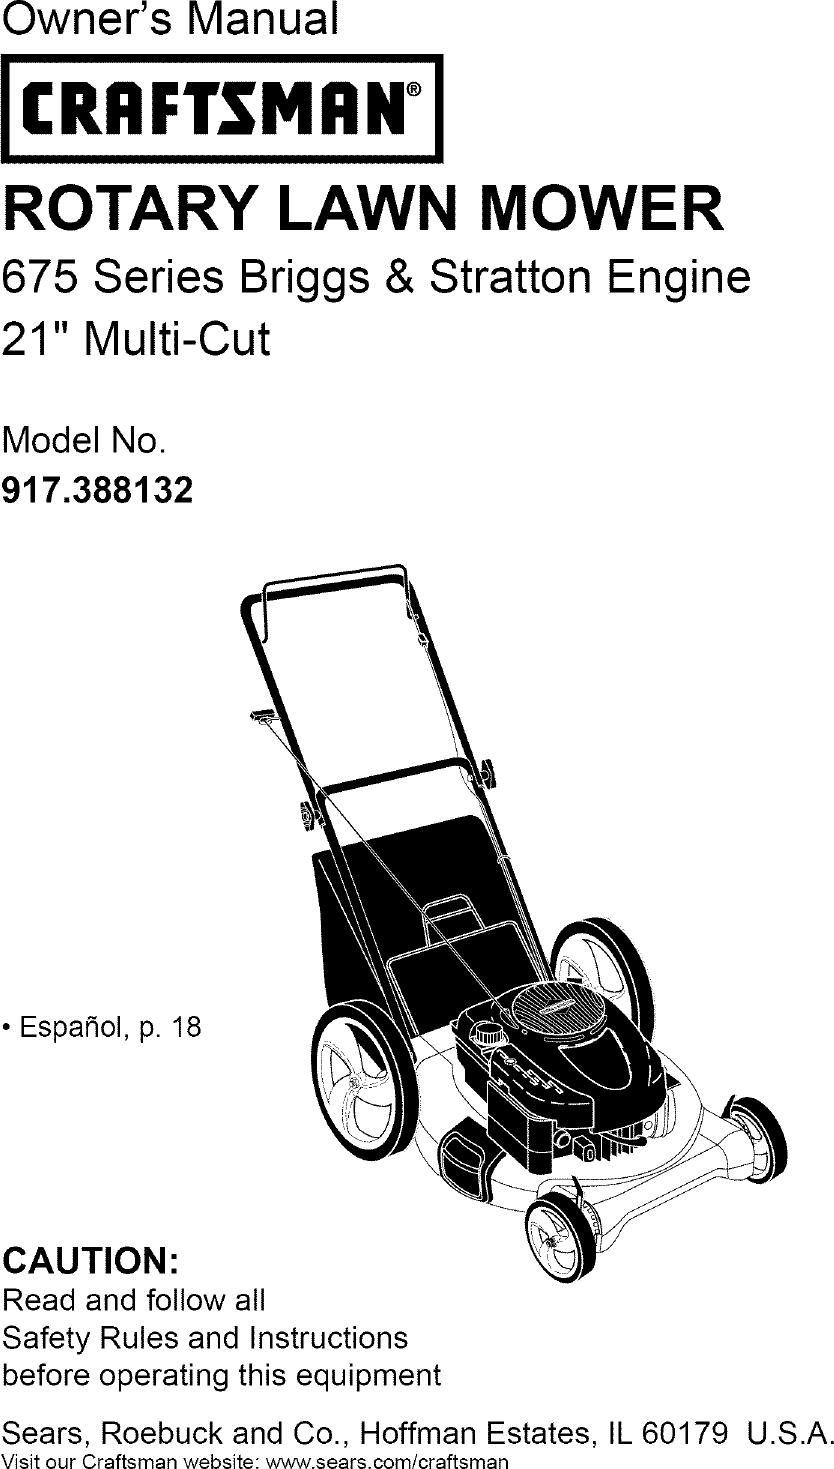 Craftsman 917388132 User Manual LAWN MOWER Manuals And